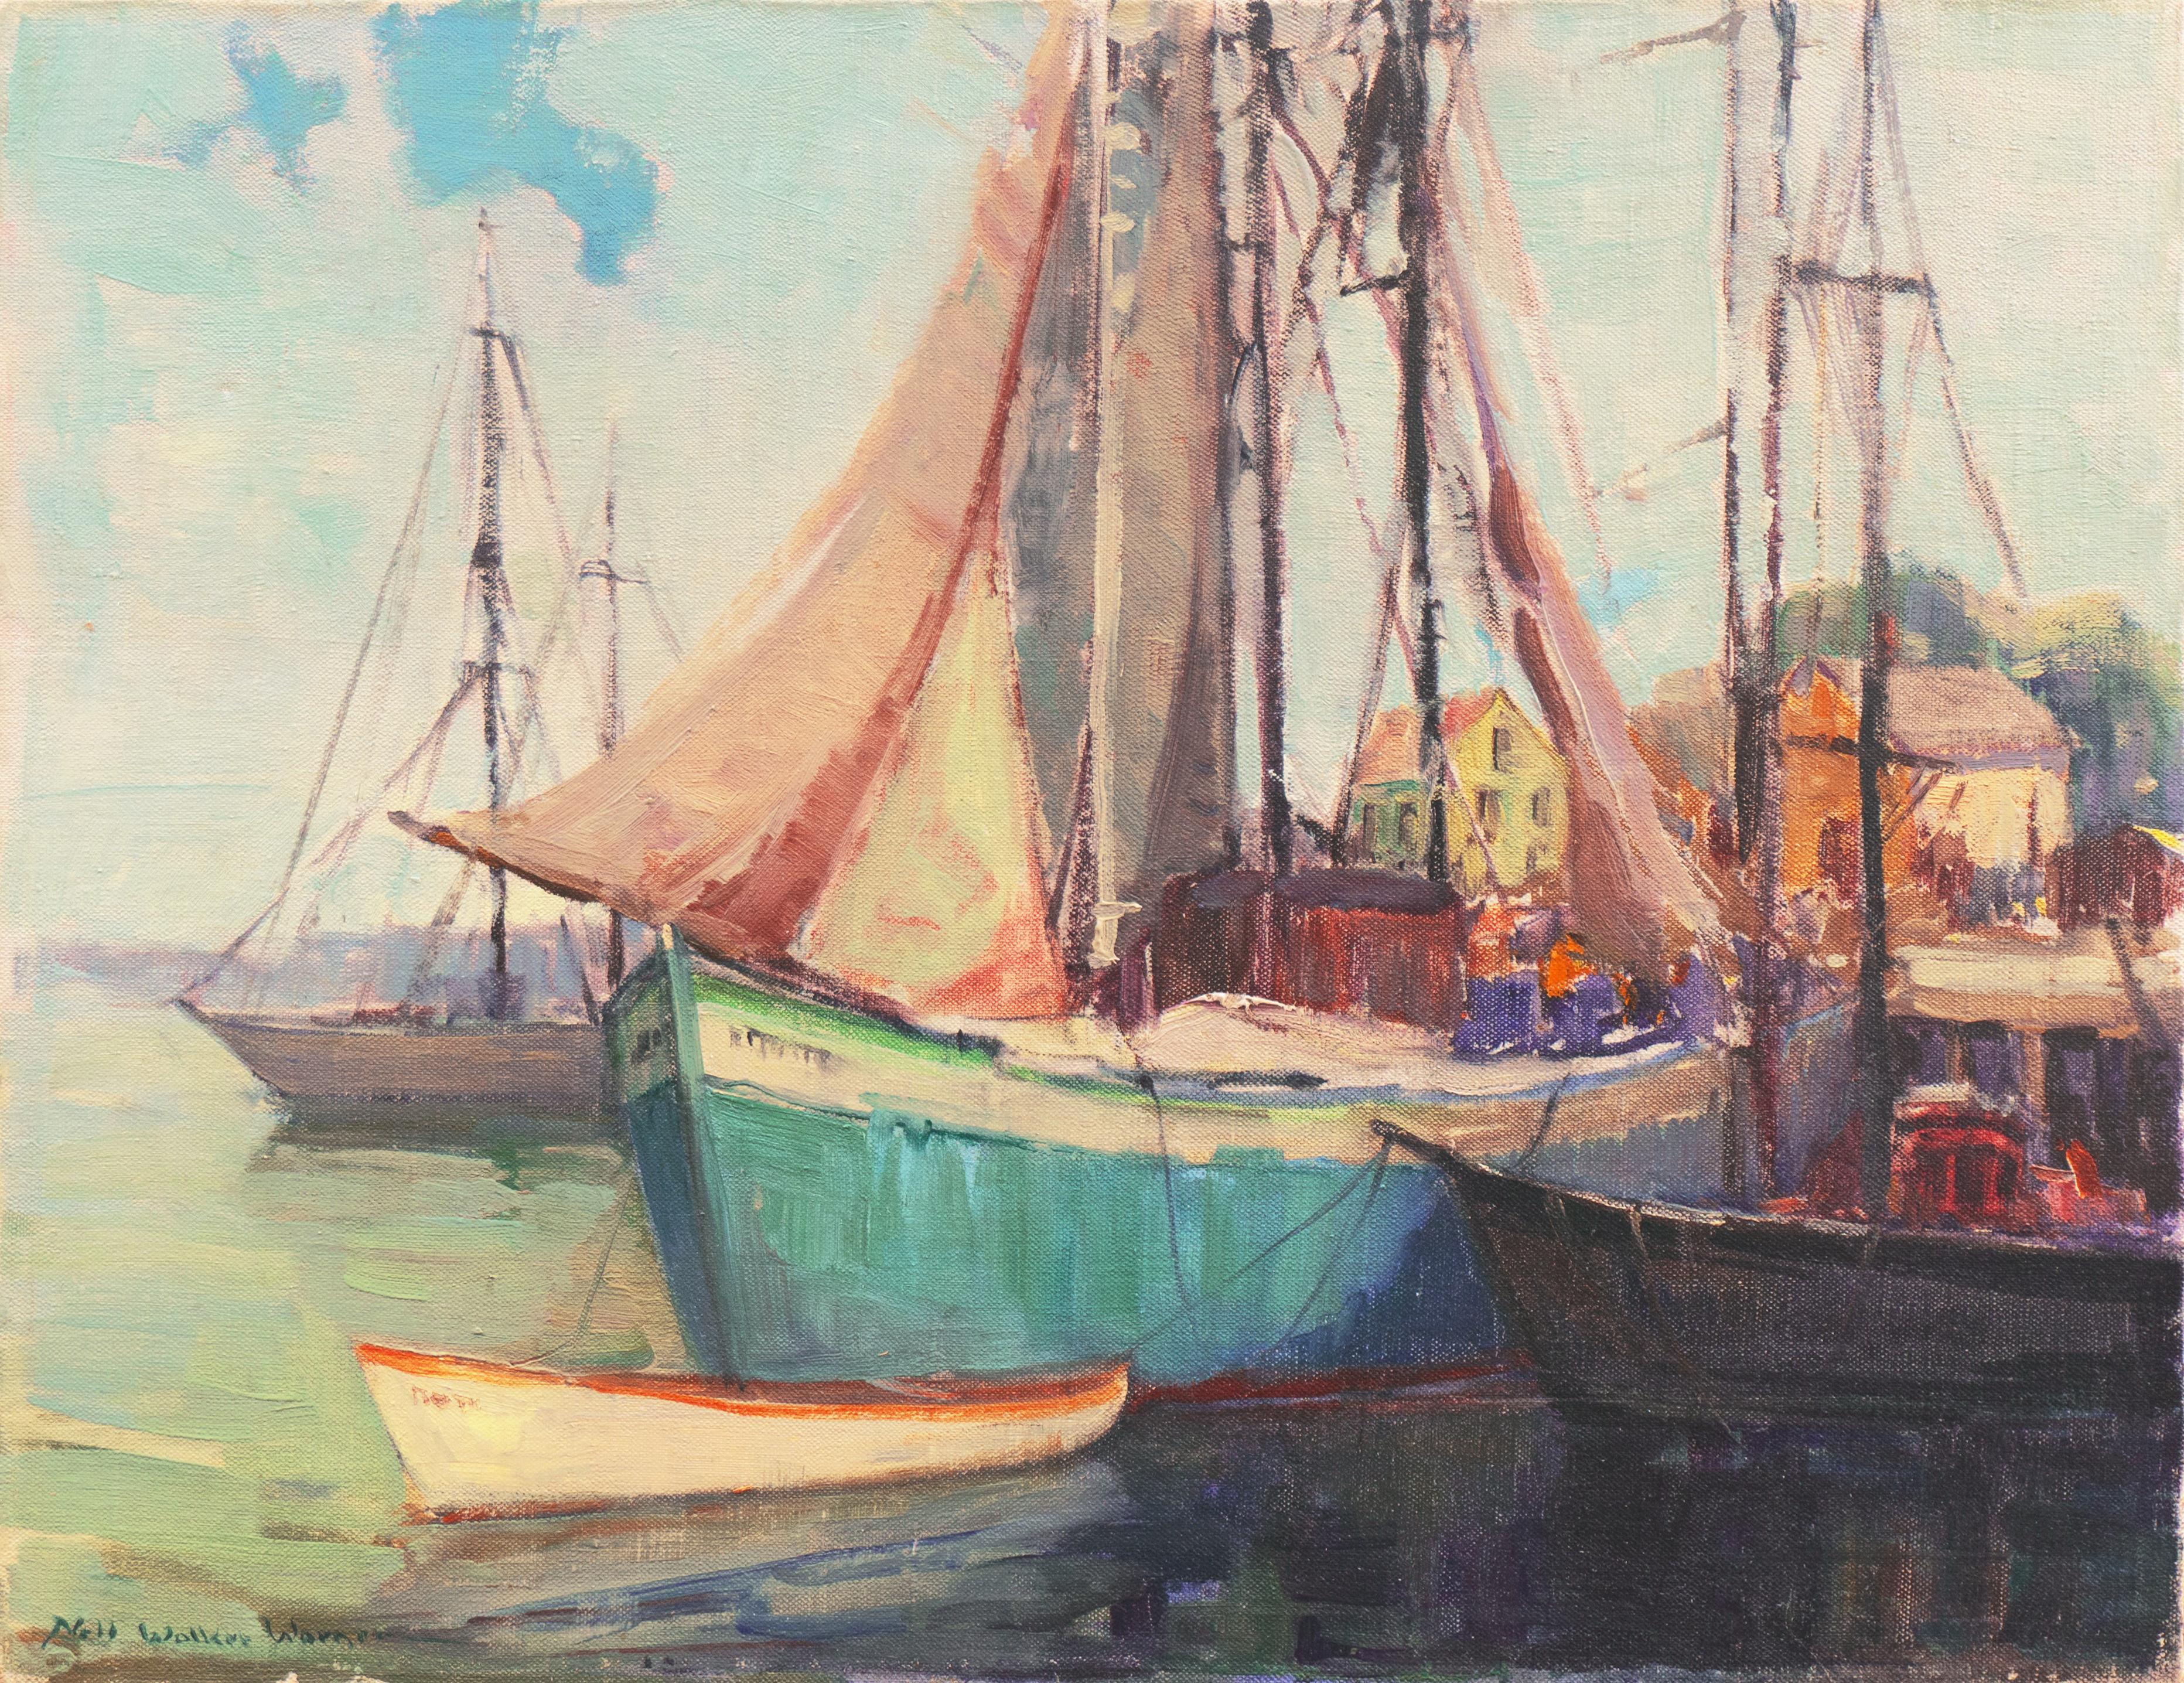 'Cape Ann Harbor', Woman Artist, Massachusetts, Rockport, Gloucester, LACMA